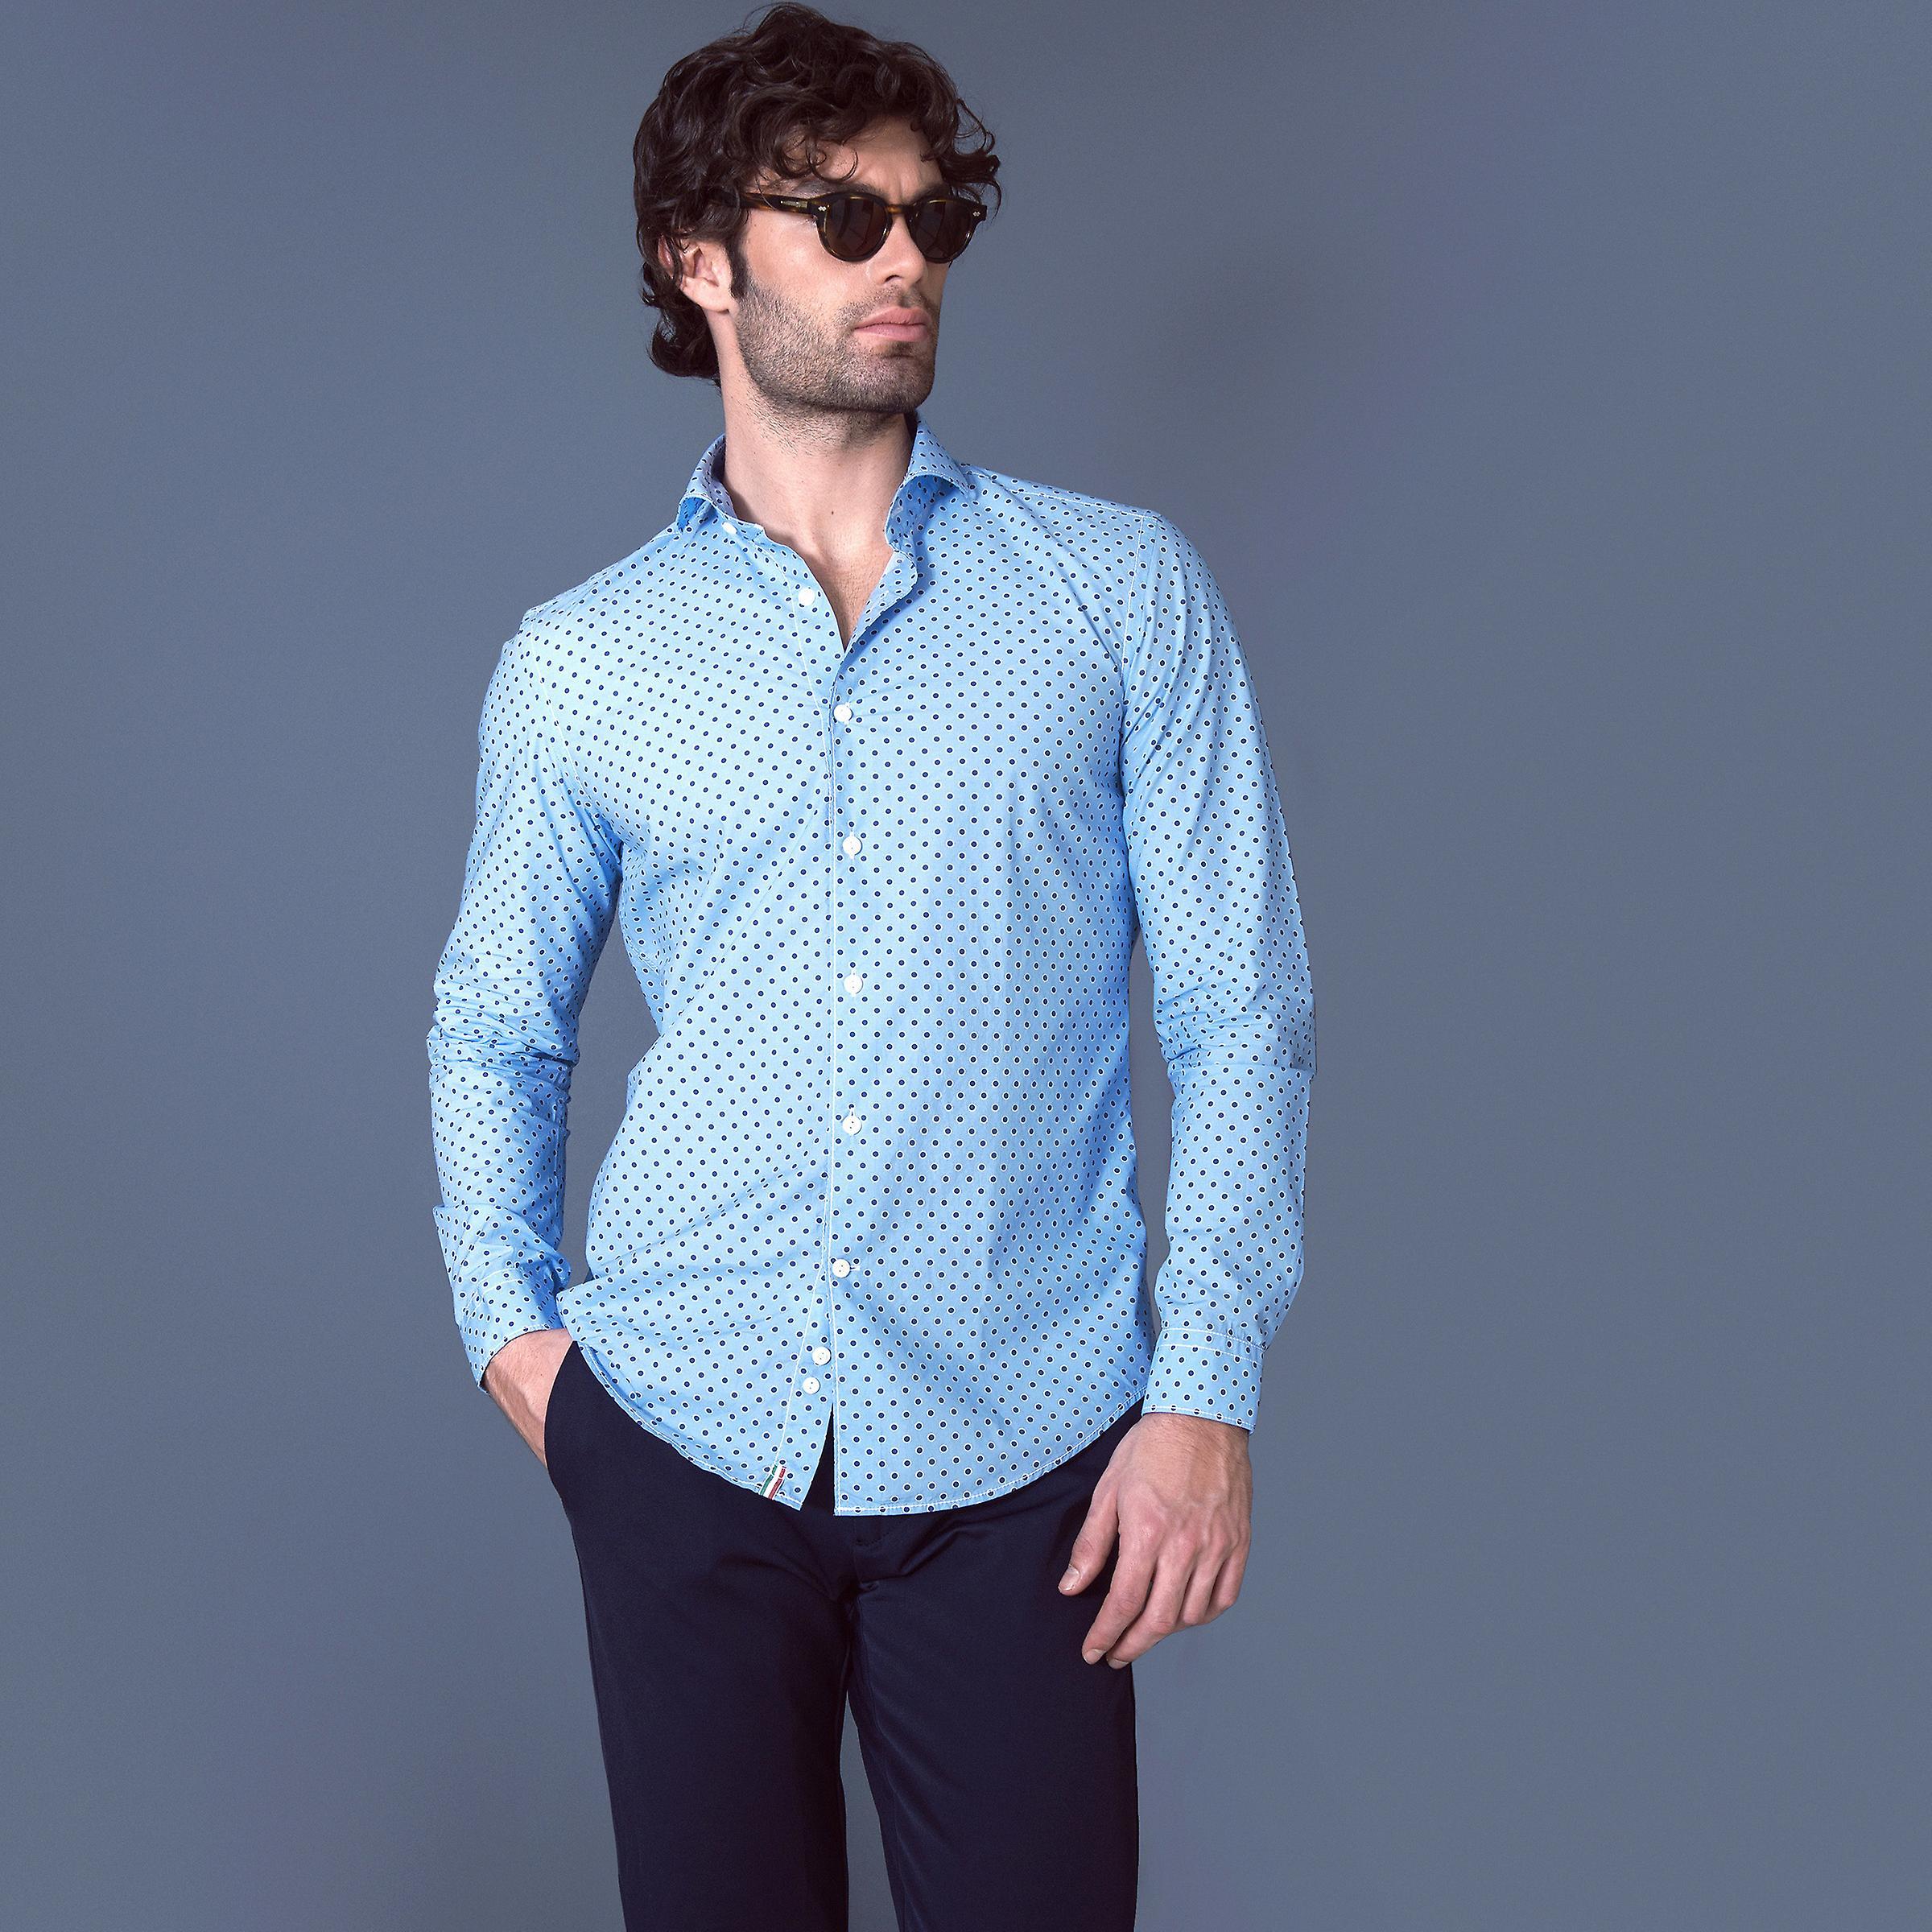 Fabio Giovanni Cosenza Shirt - Stylish Polka Dot Shirt - Mens Italian Casual Shirt